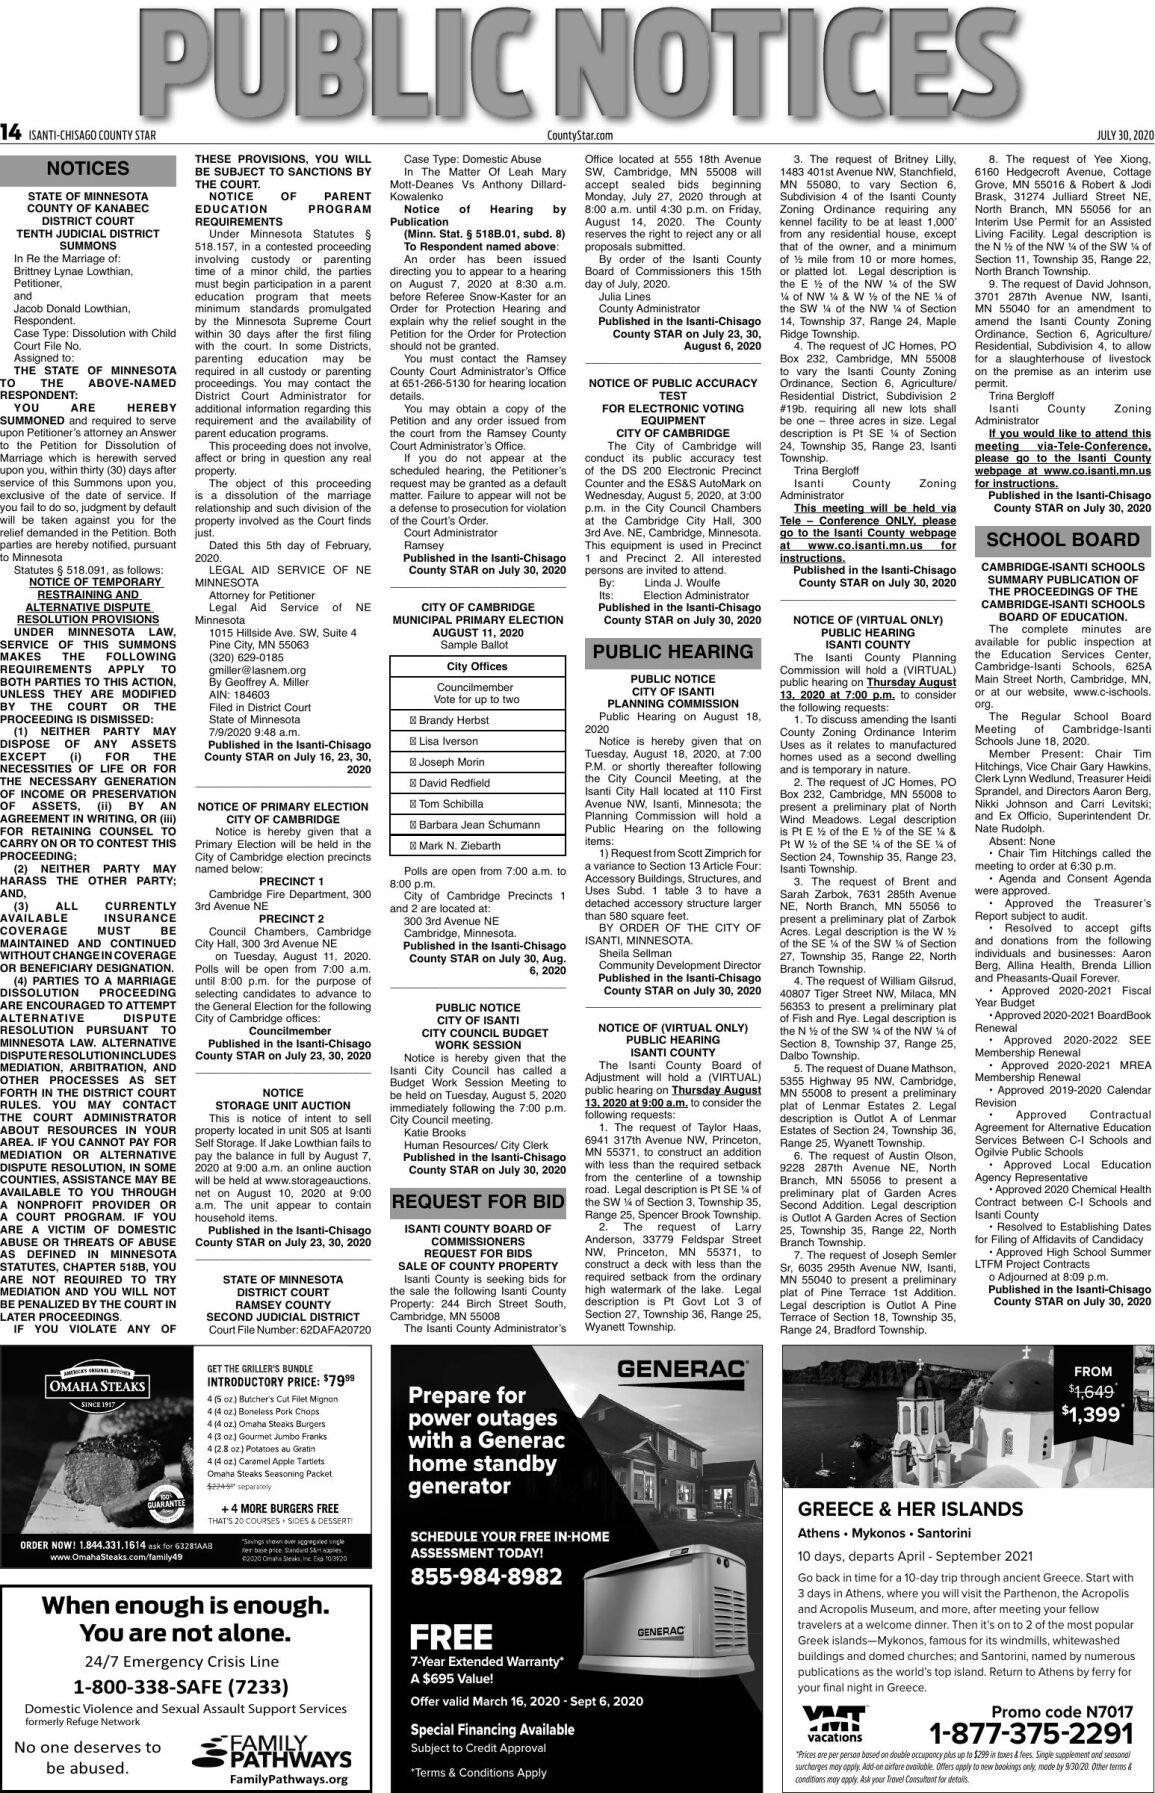 Public Notices - July 30, 2020